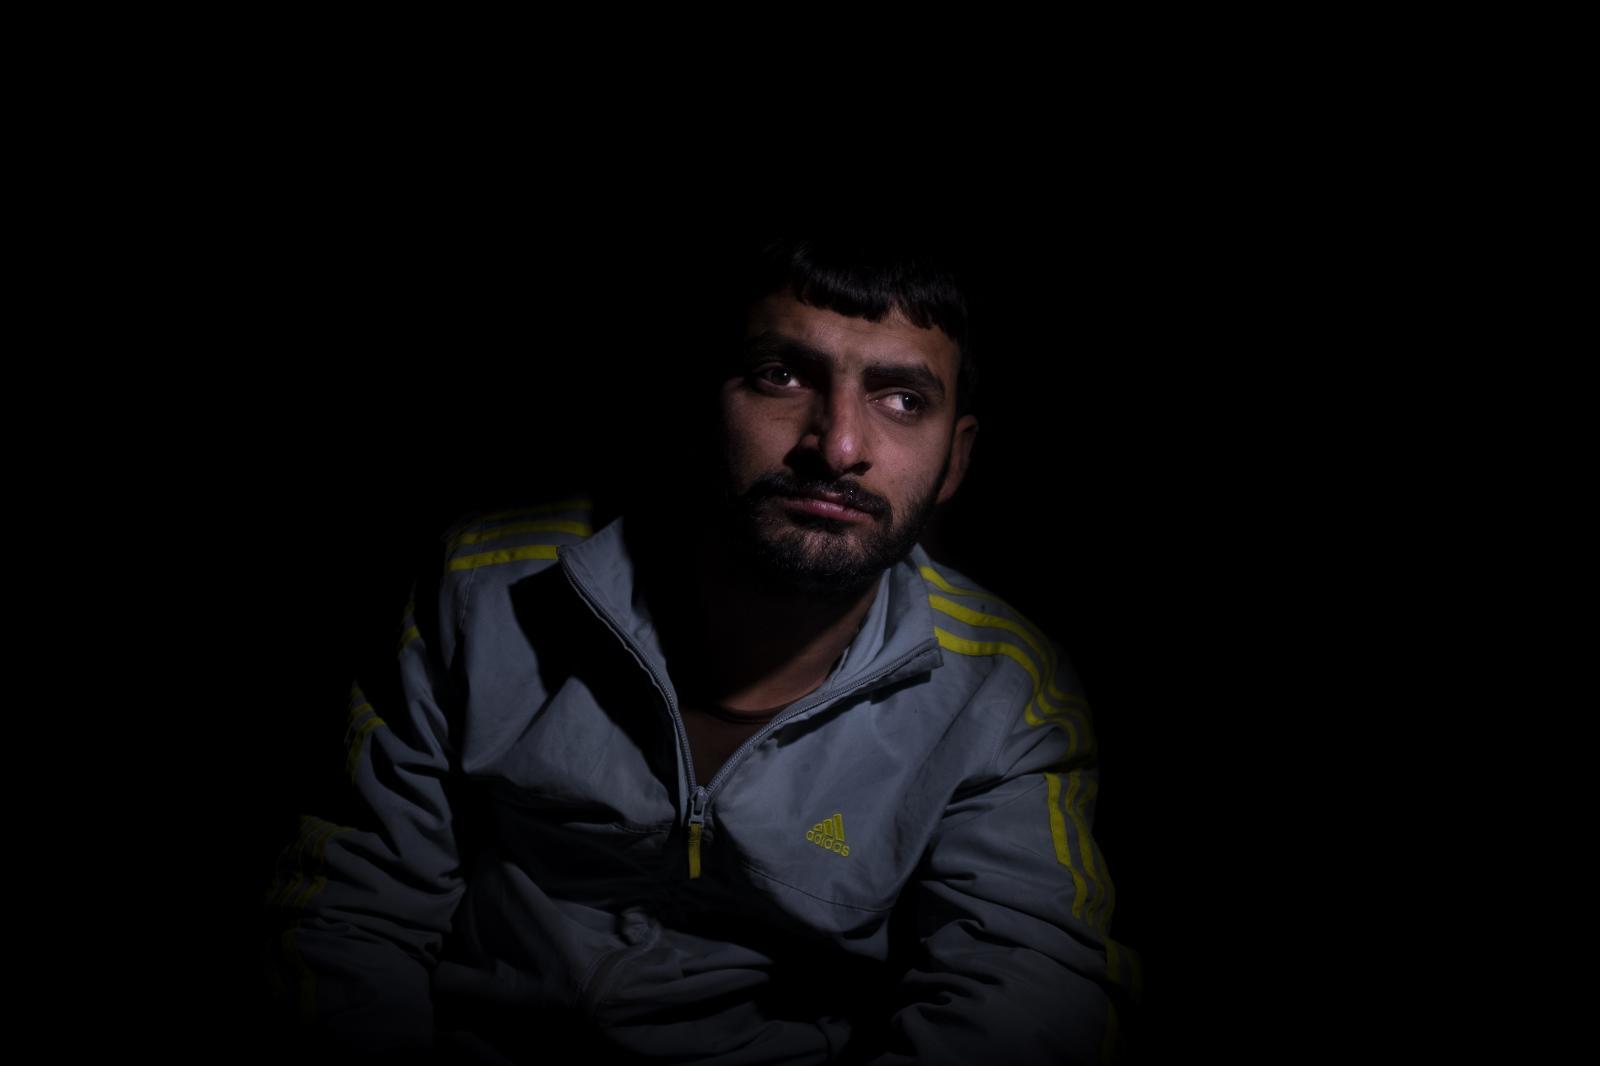 Photography image - Loading Rojava-Lubaki-Photographer-Refugee25.jpg